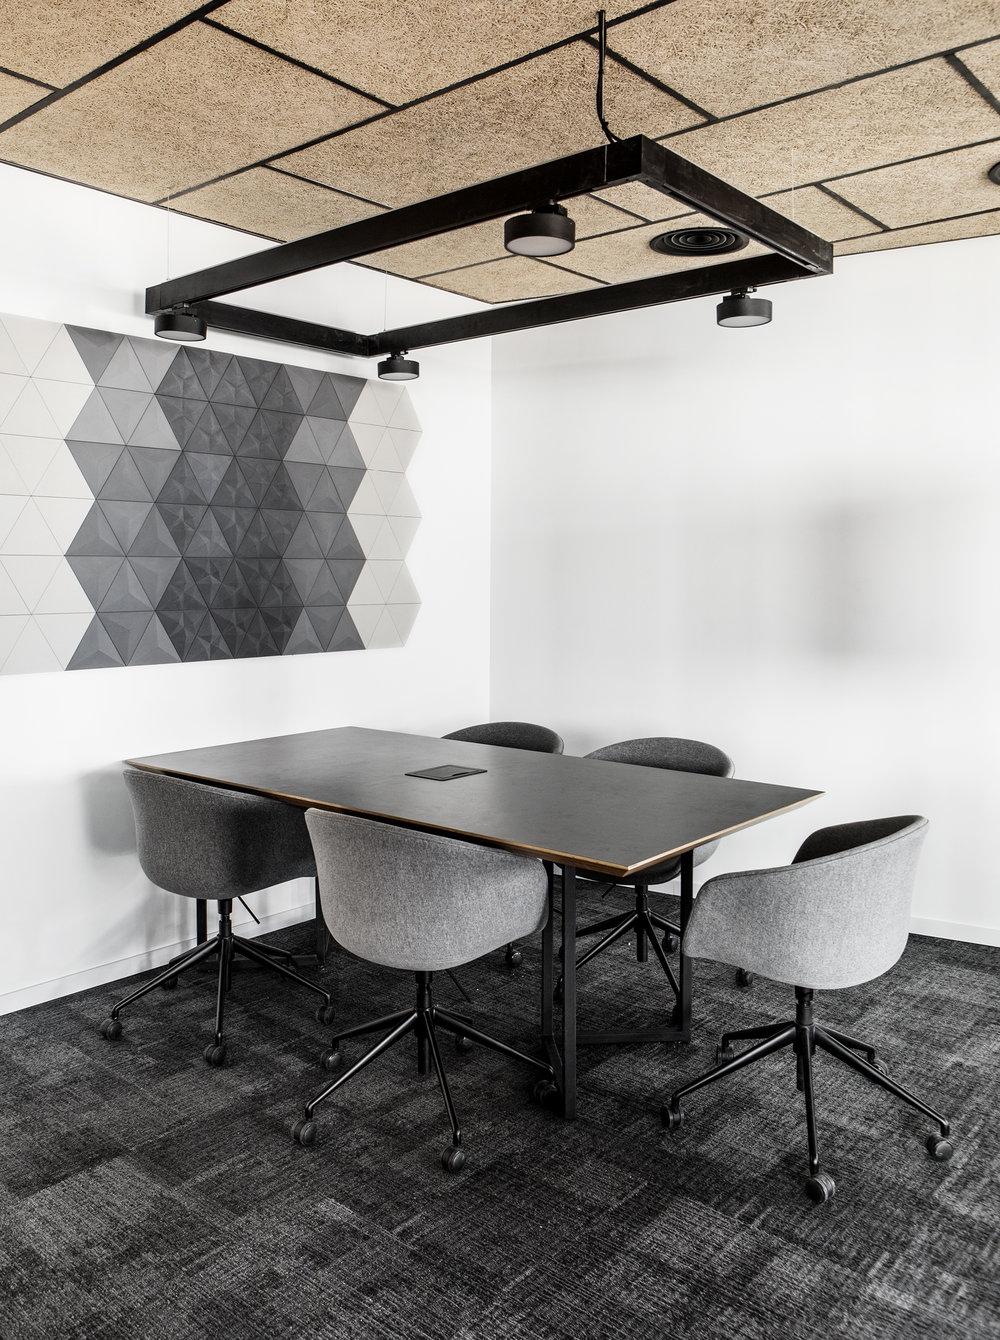 014_optimove - roy david architecture studio.jpg.jpg